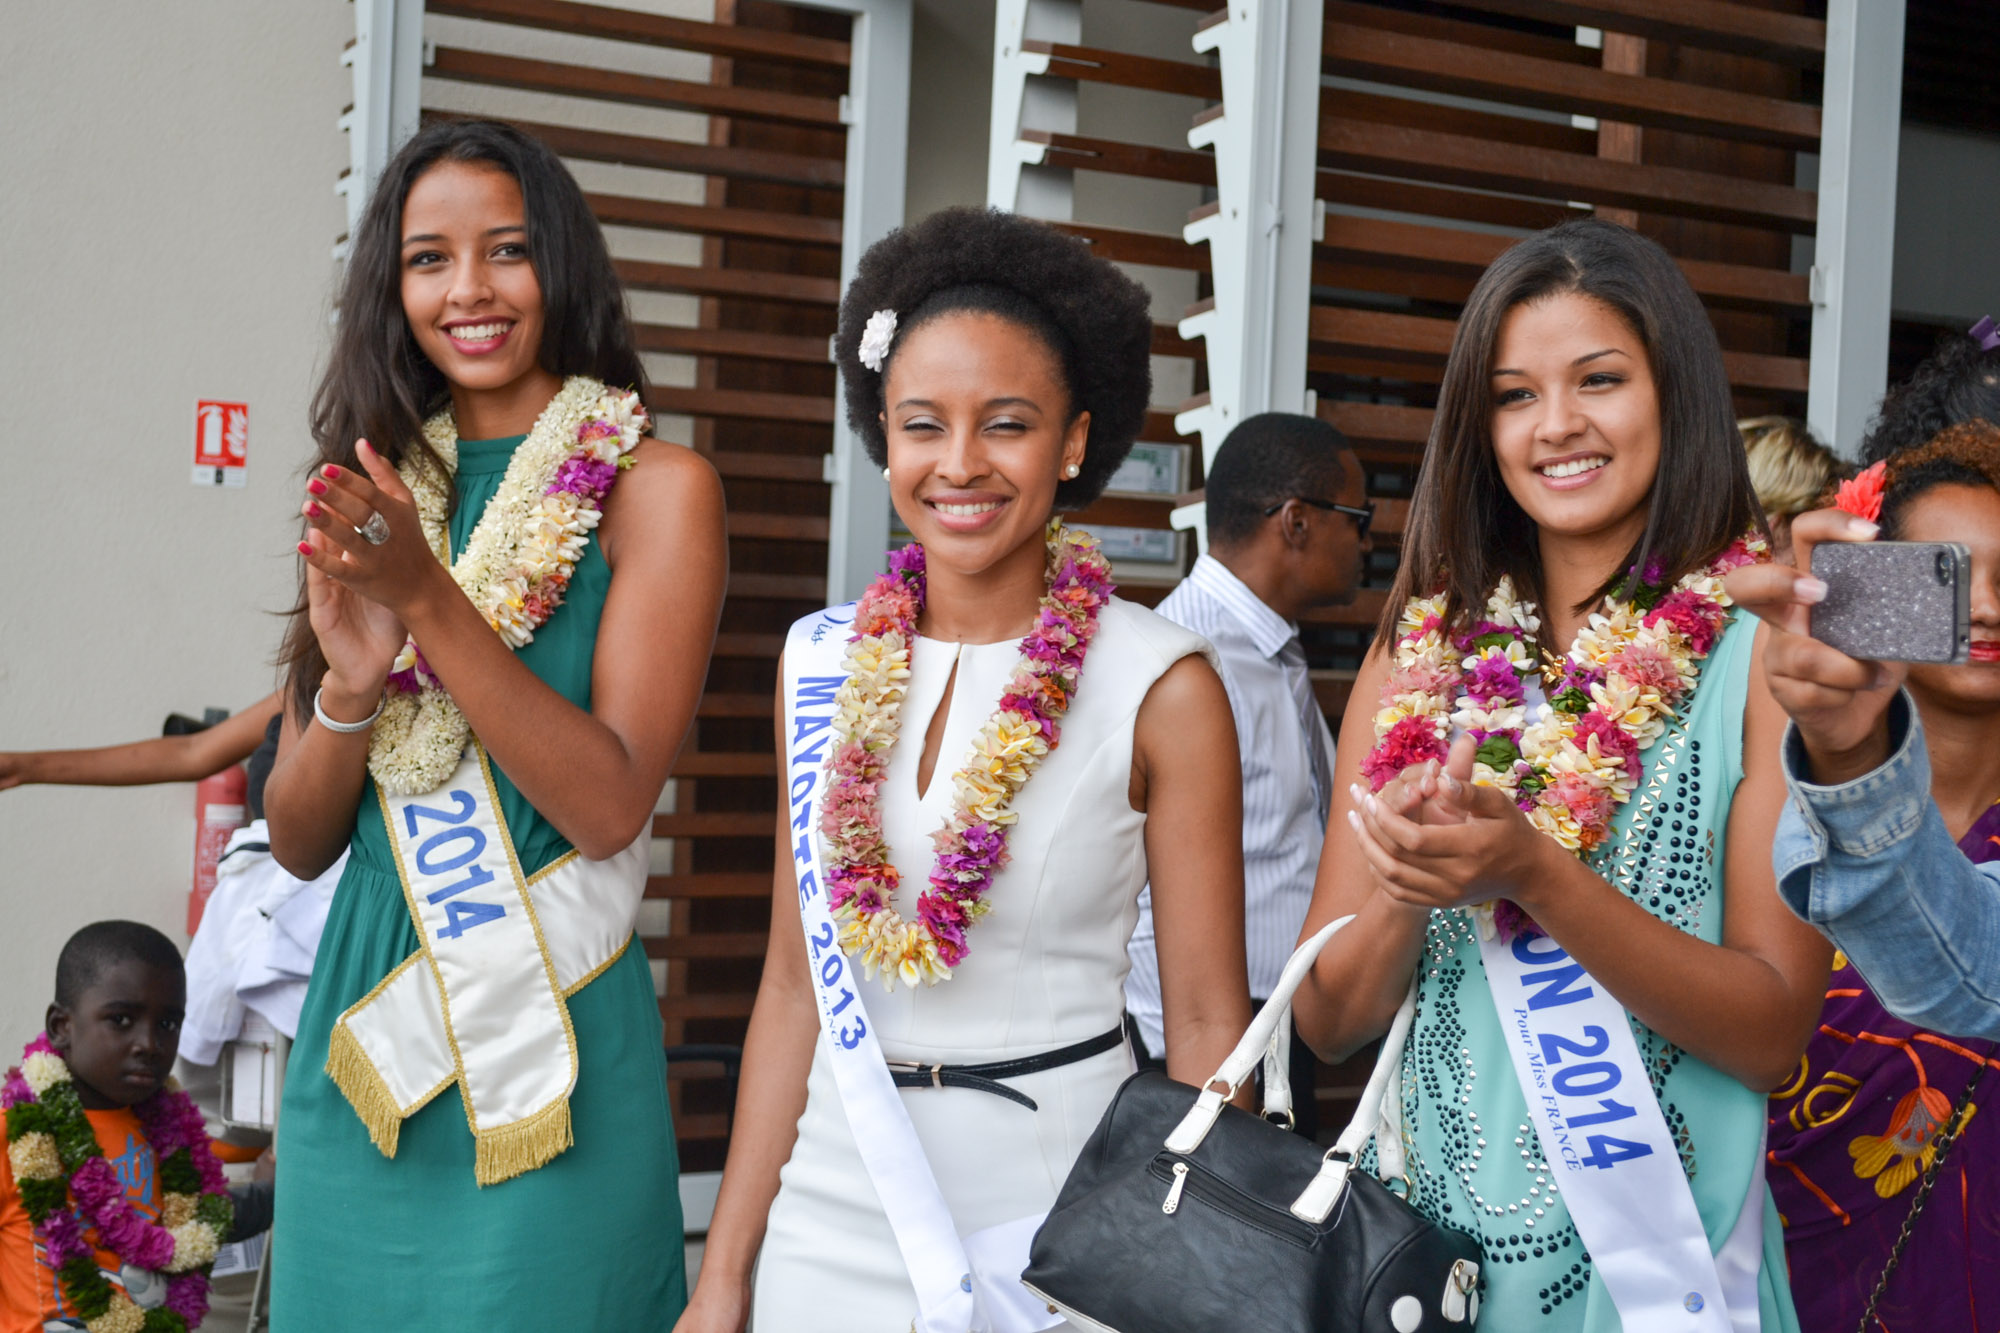 Flora Coquerel, Miss France 2014, Daniati, Miss Mayotte 2013, et Ingreed Mercredi, Miss Réunion 2014